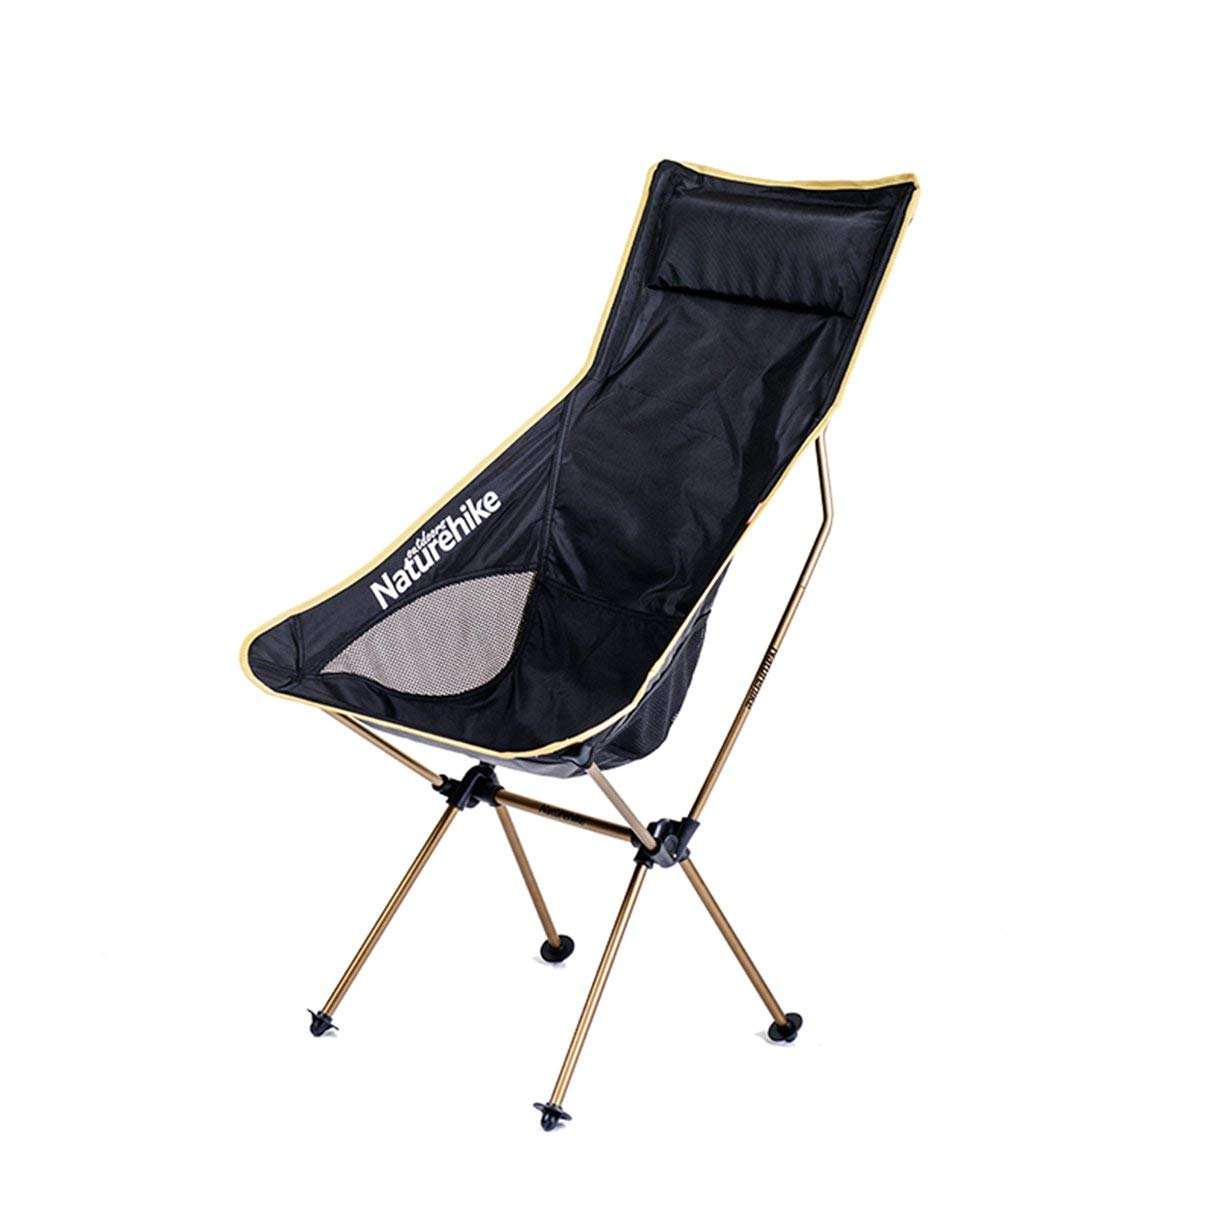 Wafalano Naturehike Ultralight Moon Stühle Gartenstuhl Angeln Der Direktor Seat Camping Abnehmbare Klappmöbel Indian Sessel